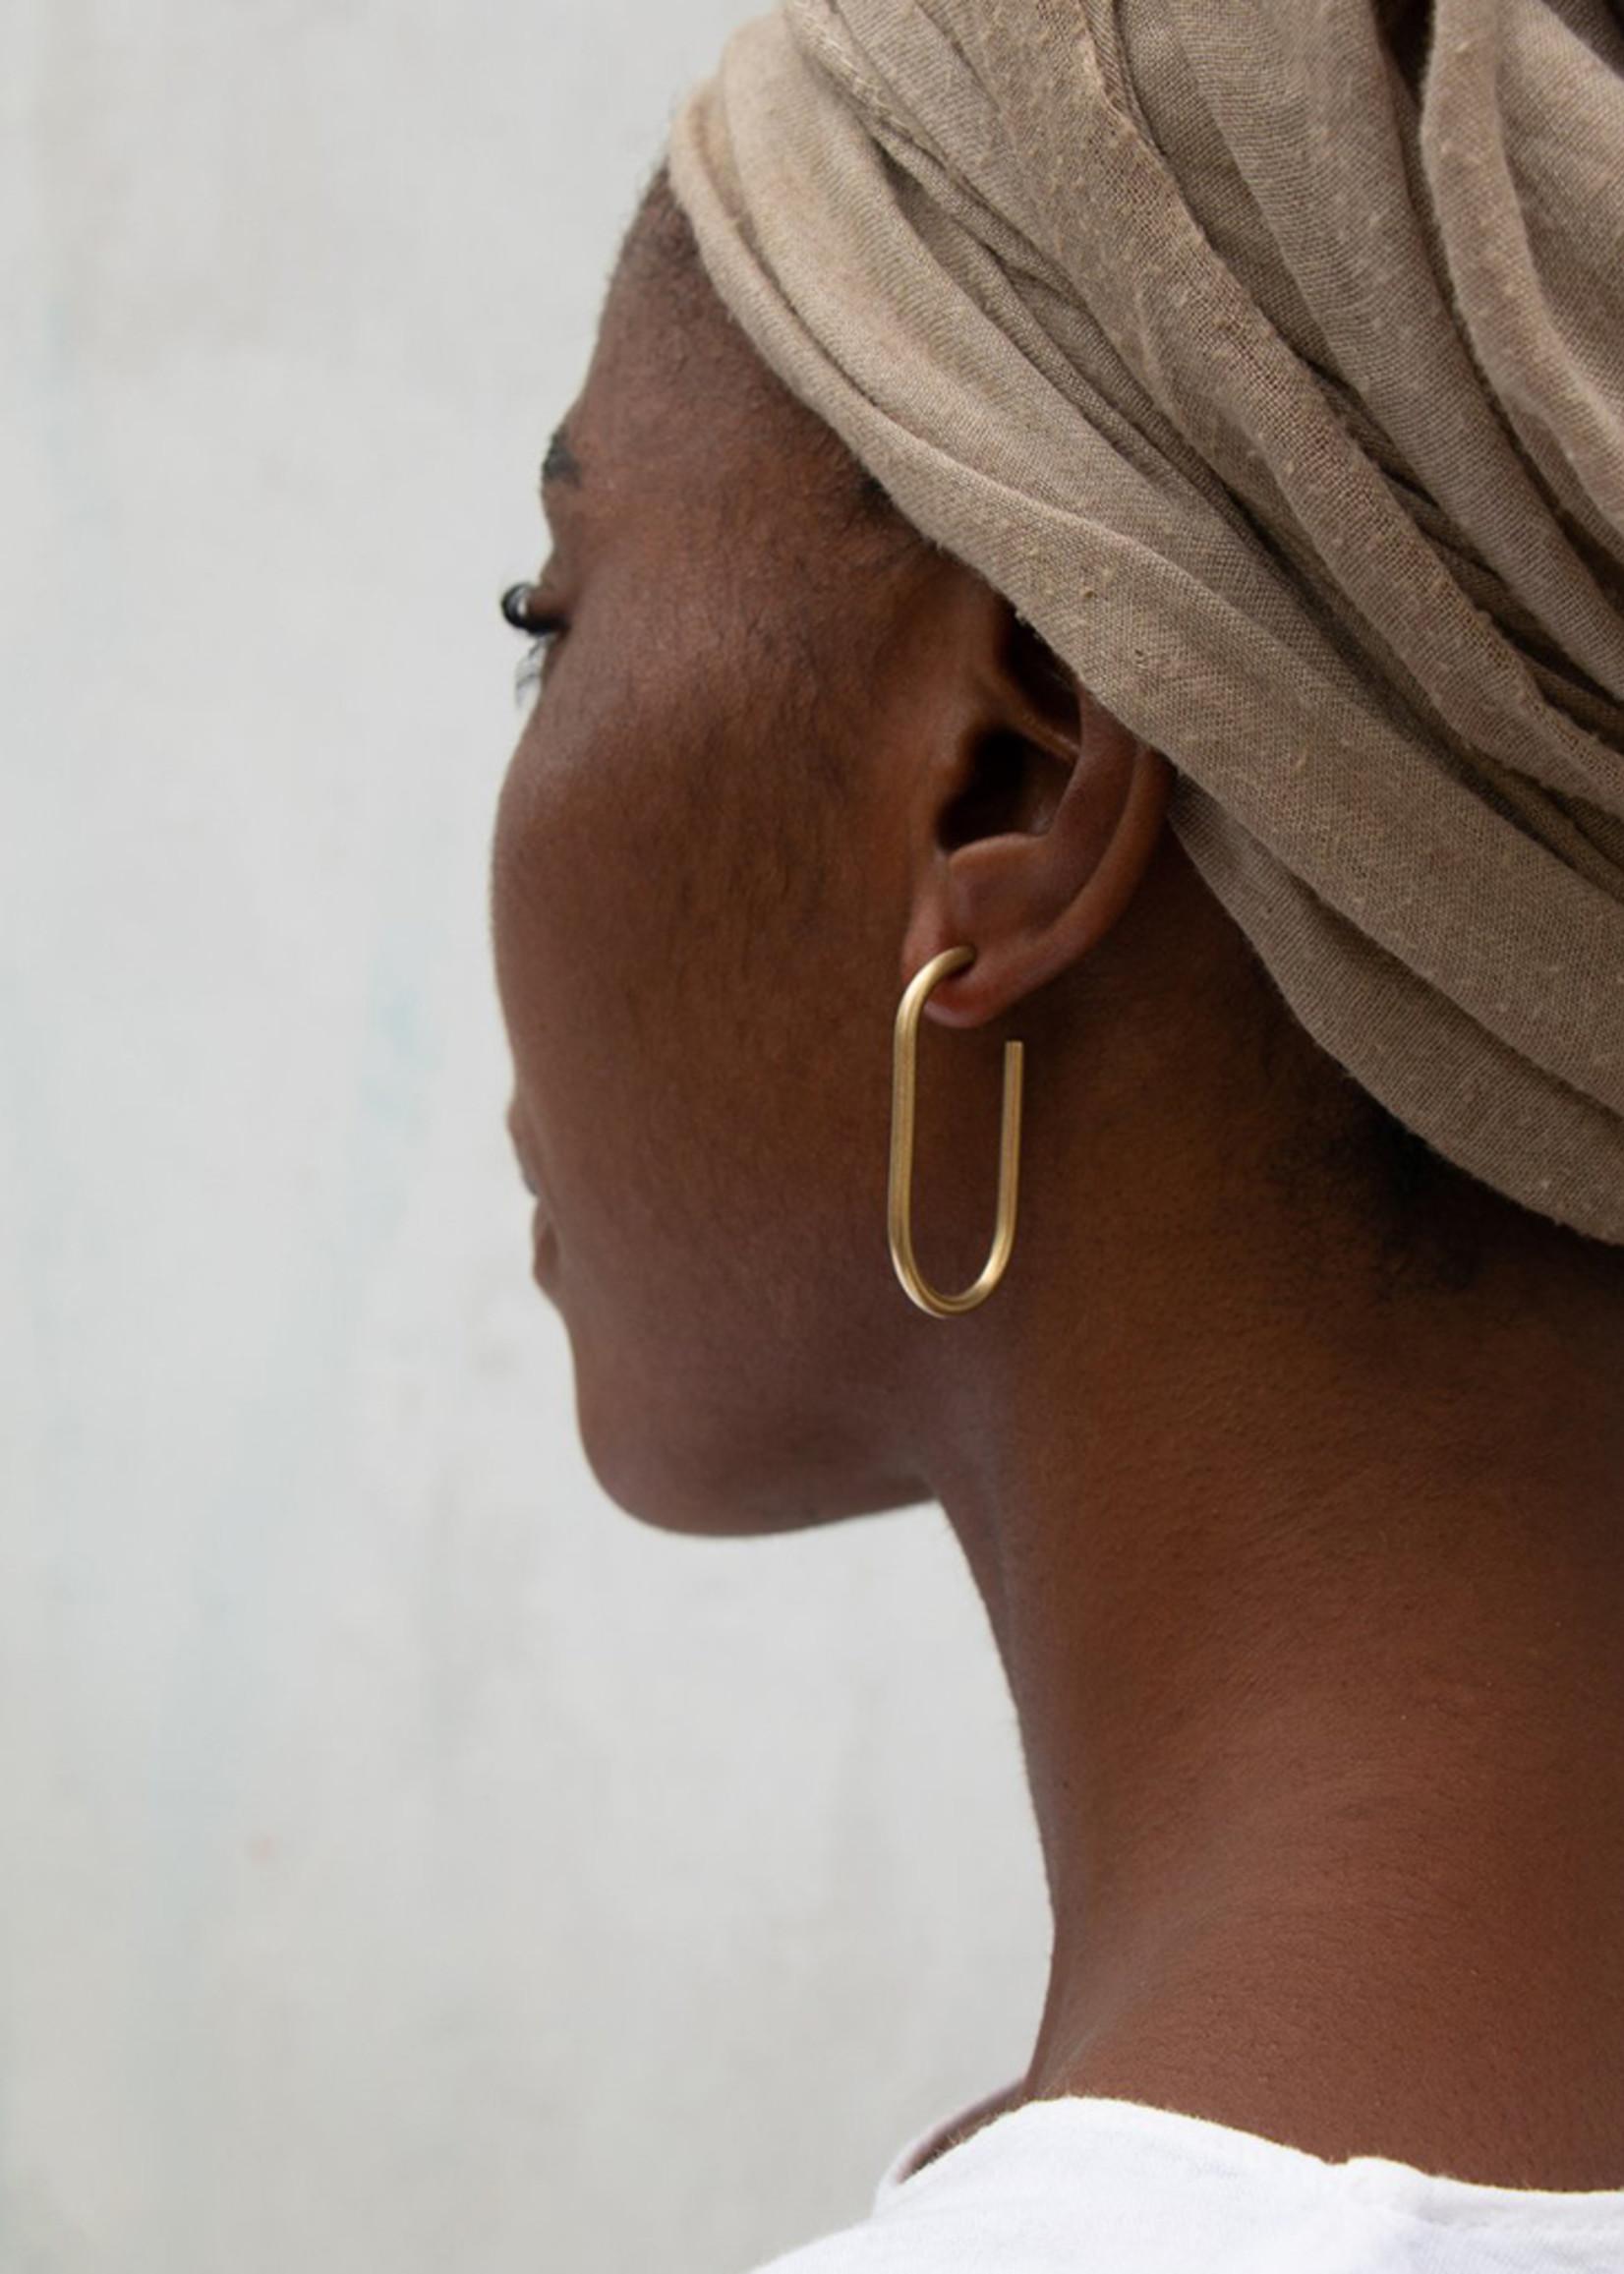 YEWO Pinda Earrings